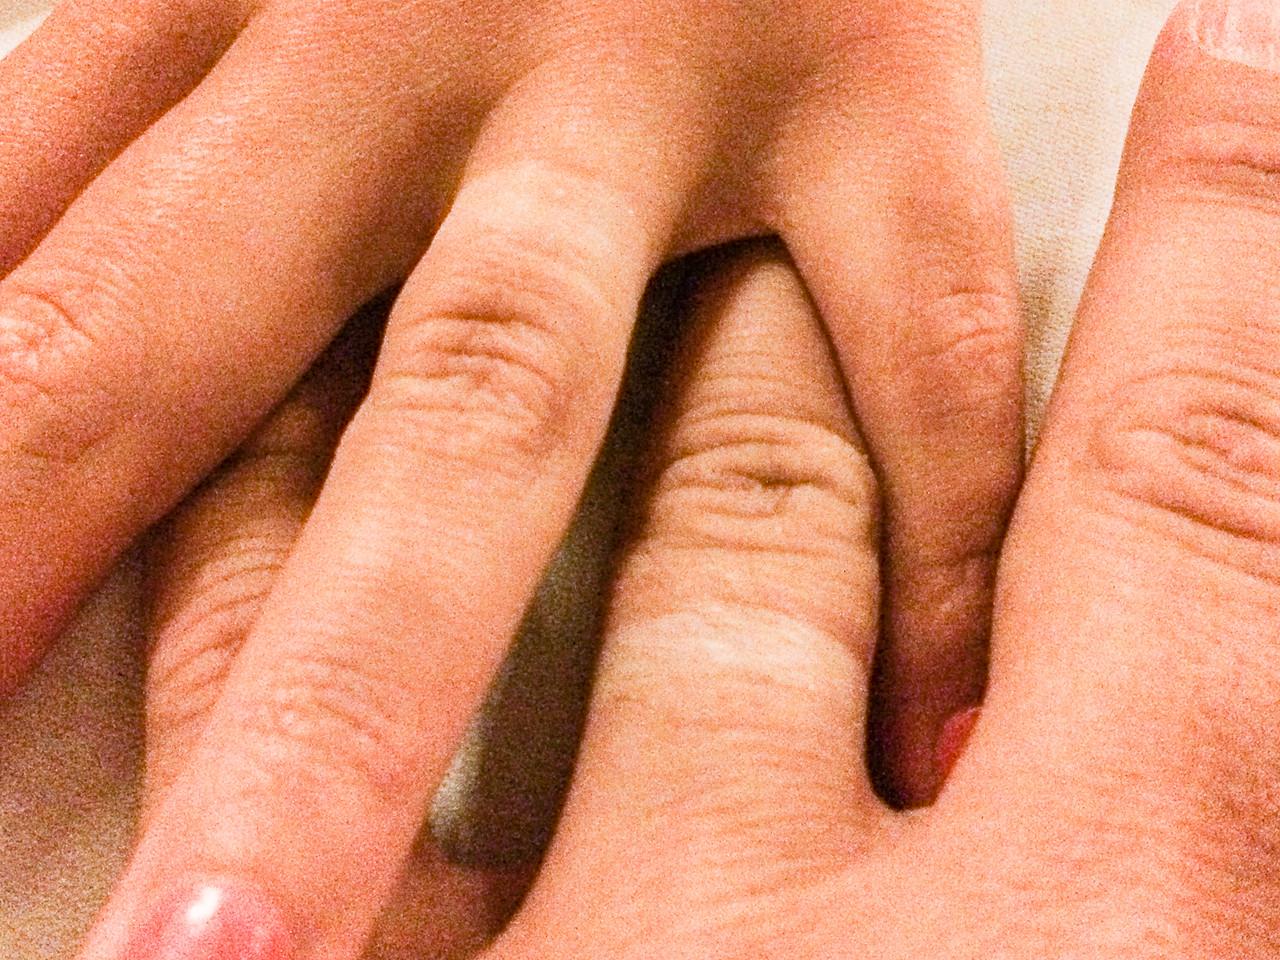 Wedding ring tan lines